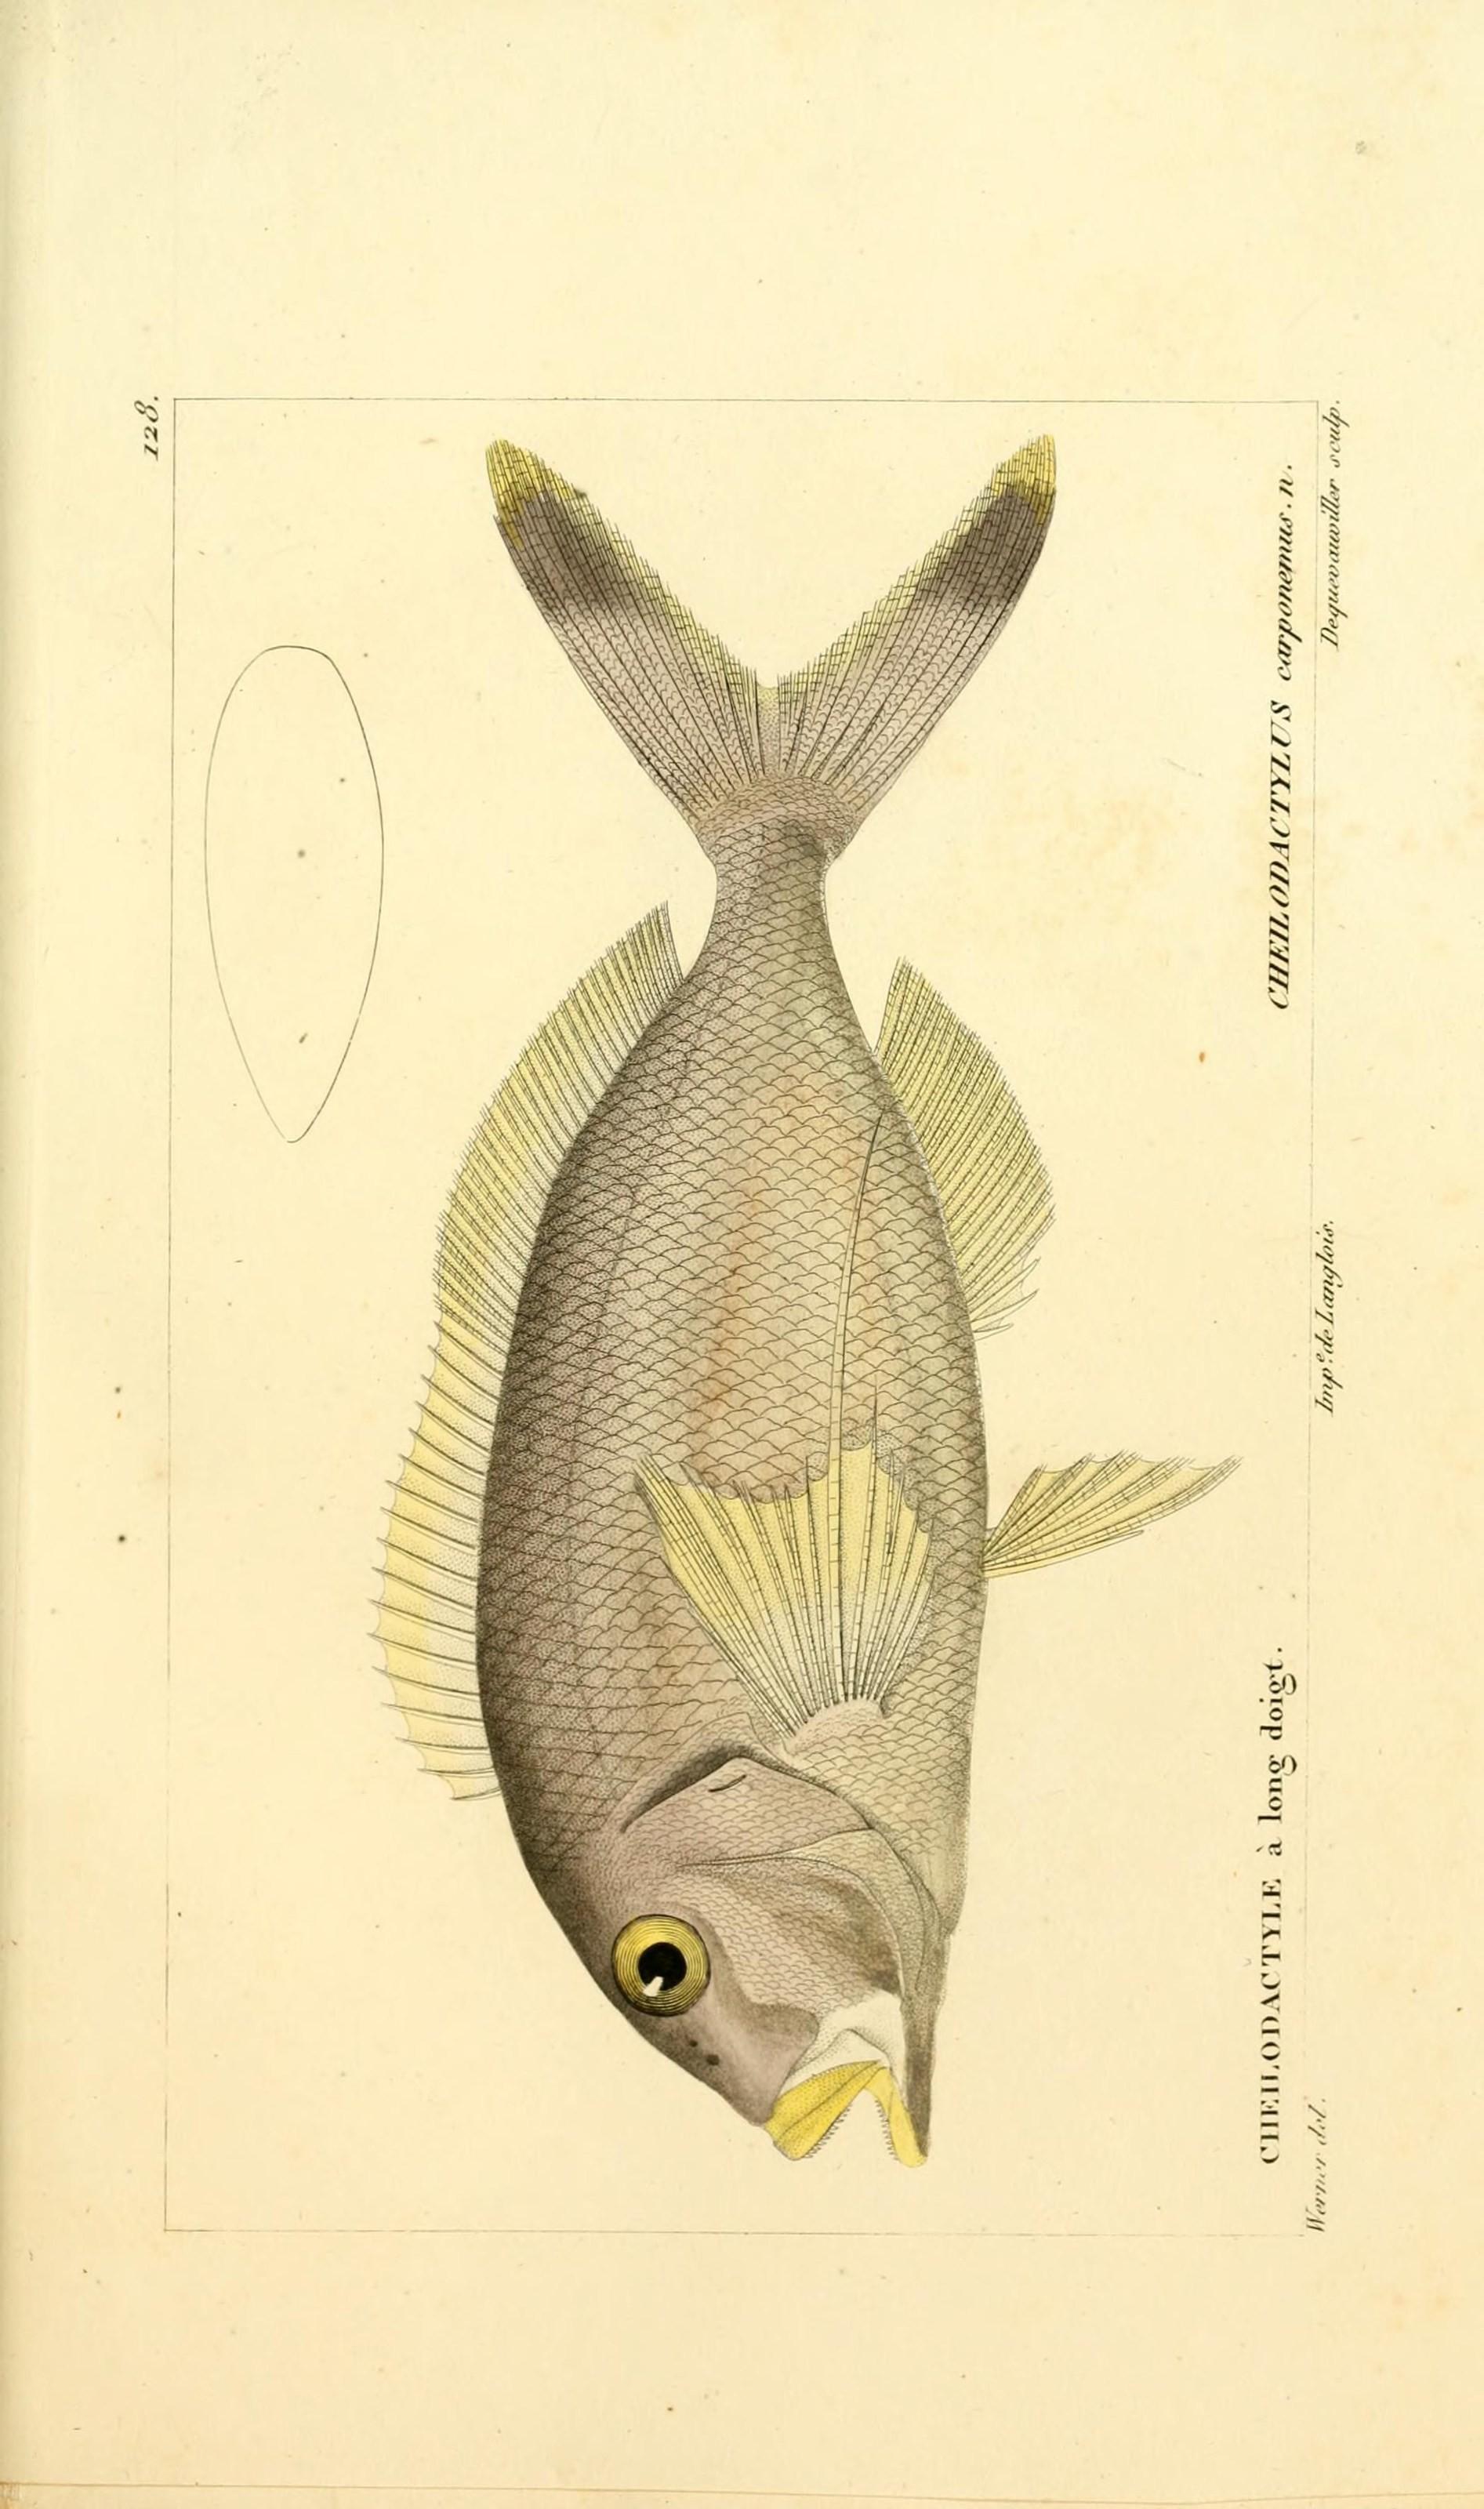 Image of Tarakihi